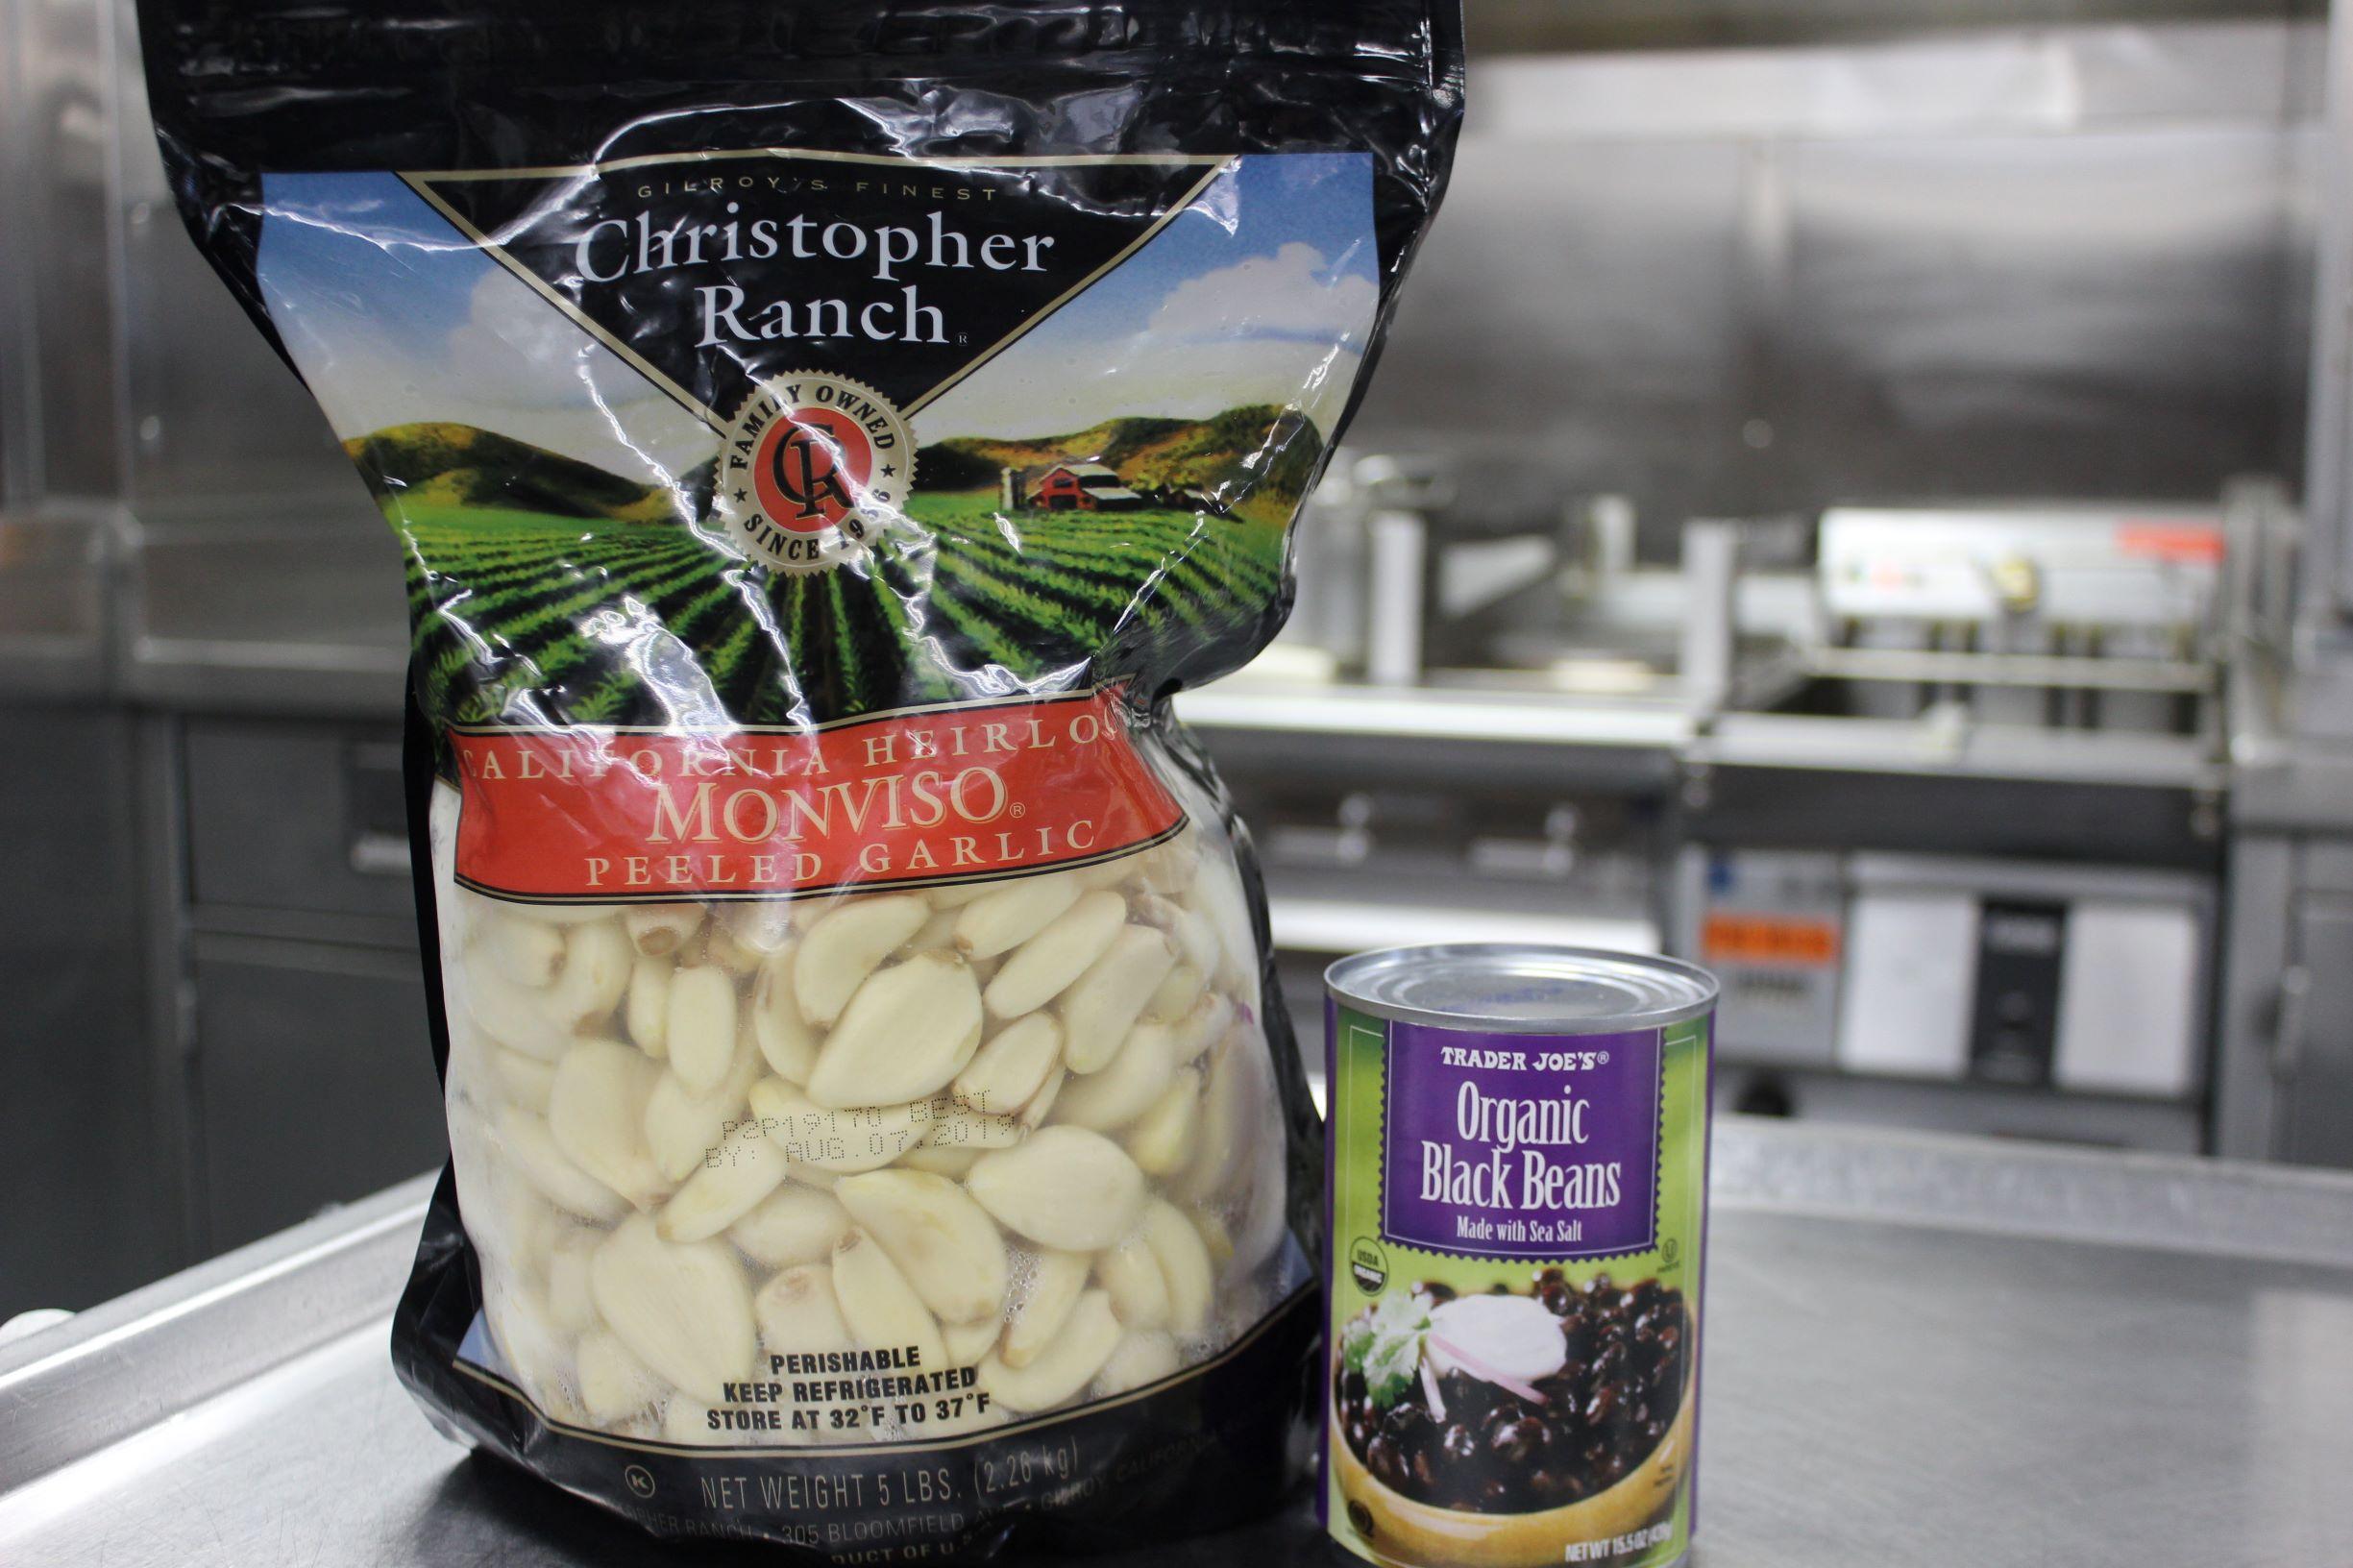 garlic and black beans